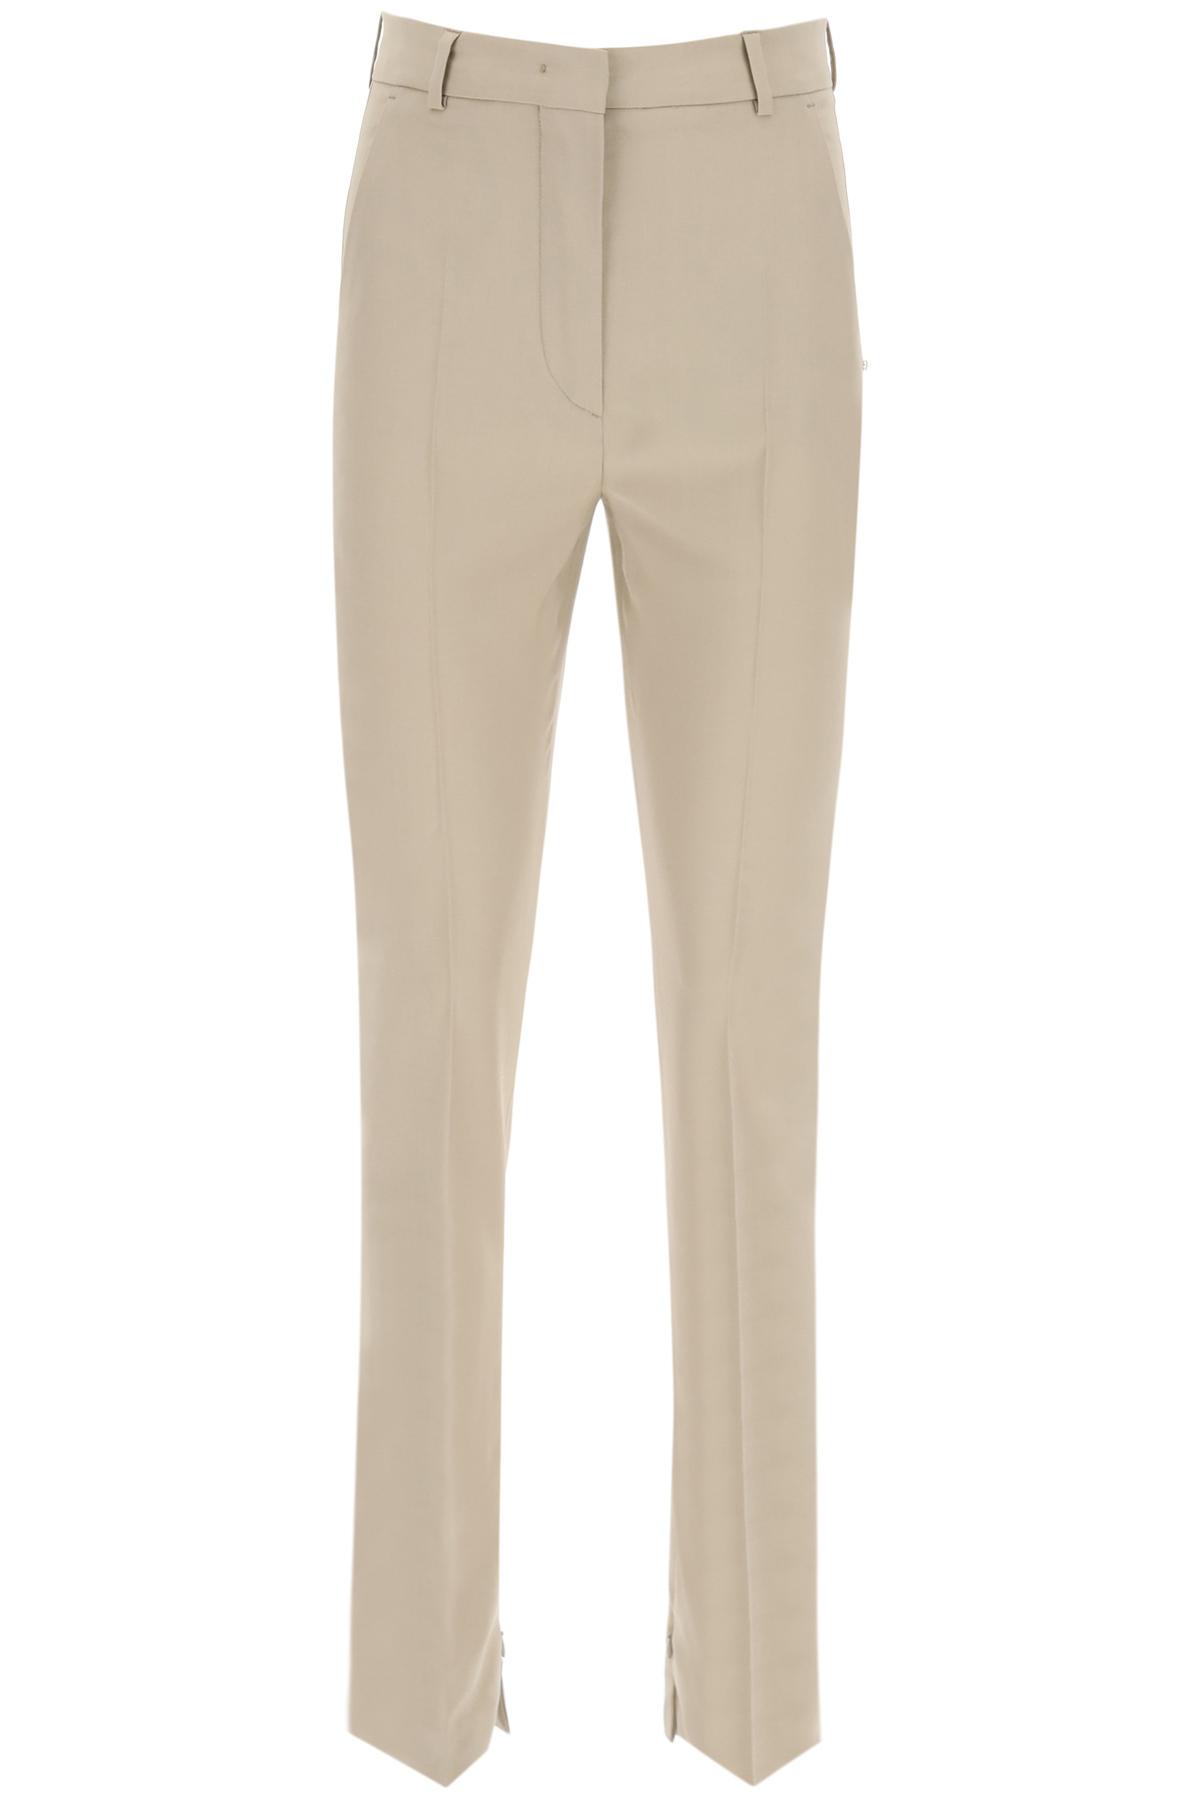 Sportmax pantaloni con zip